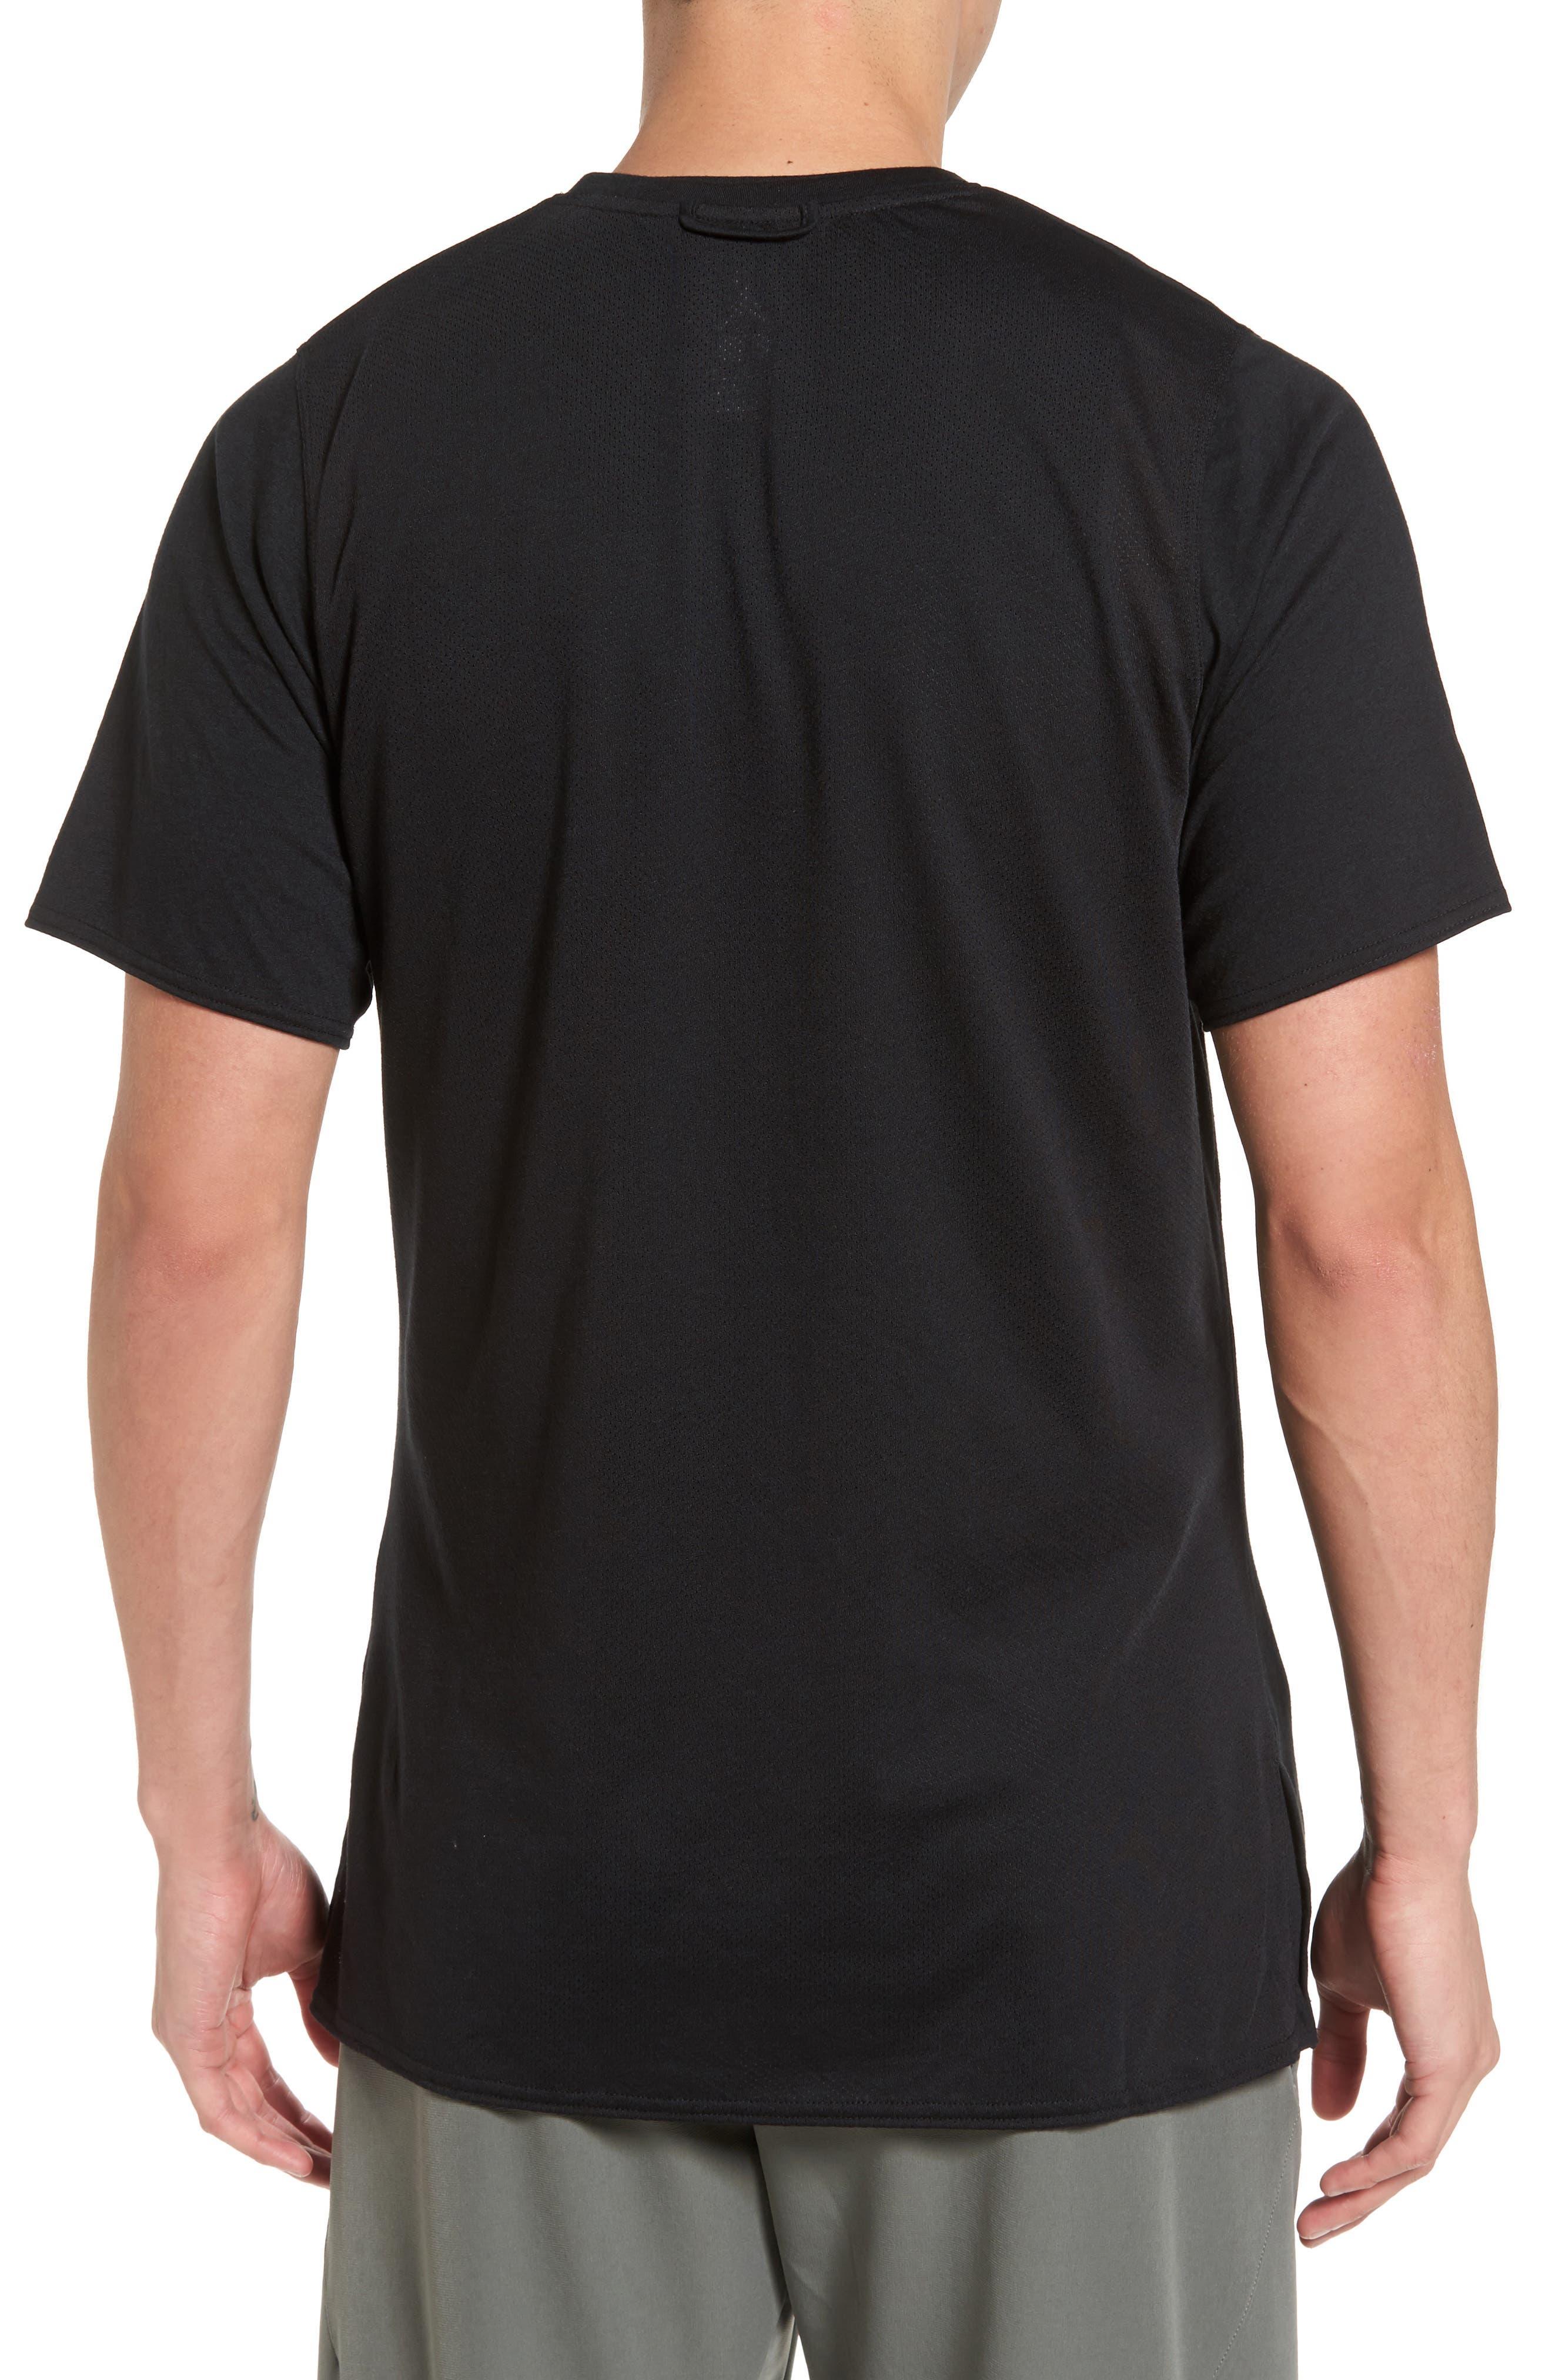 23 Alpha Dry T-Shirt,                             Alternate thumbnail 2, color,